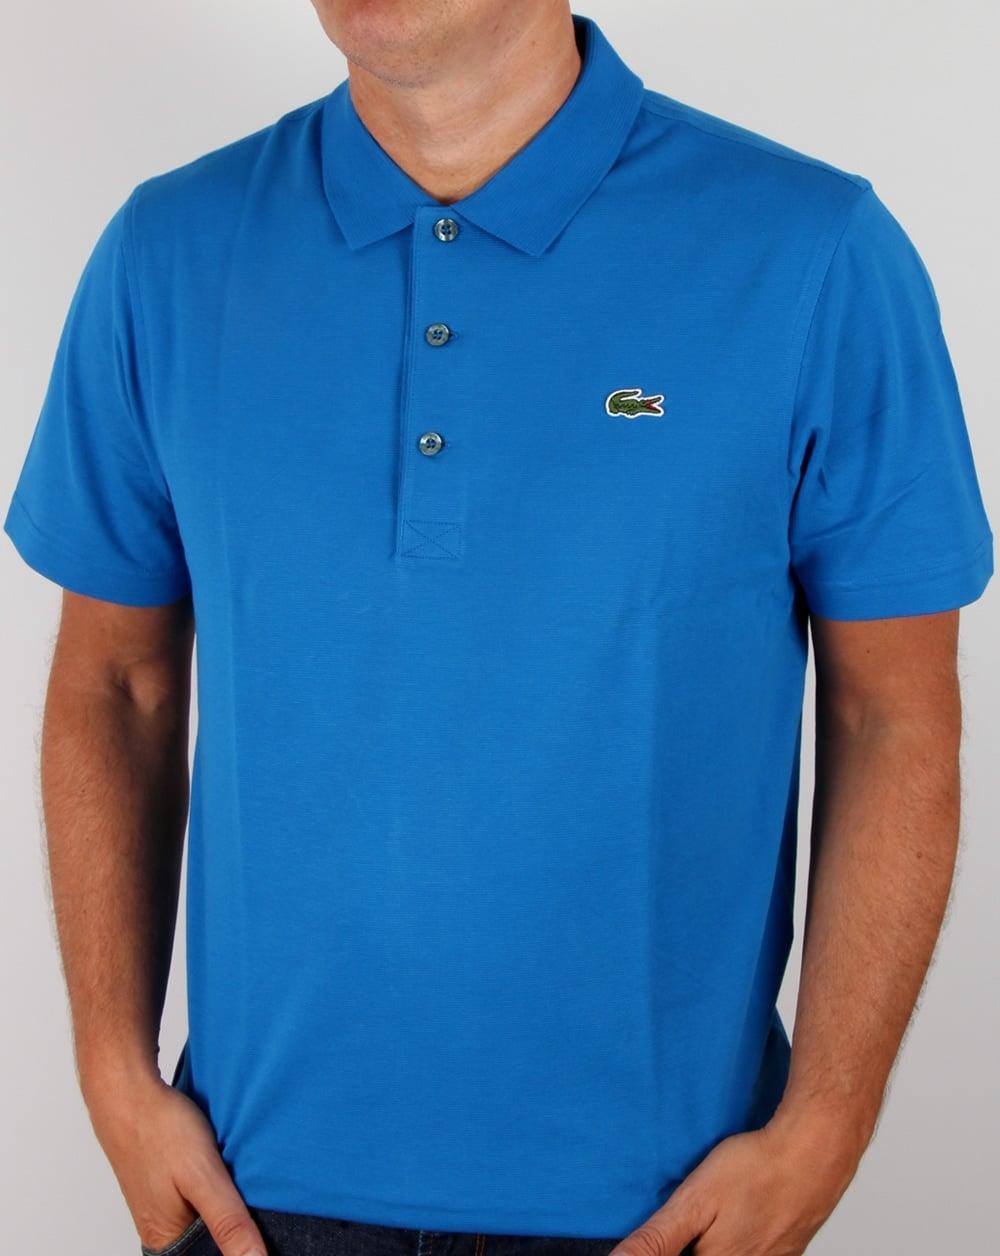 Lacoste Polo Shirt Ink Blue sport mens vintage old skool f5c0d6ce9cf